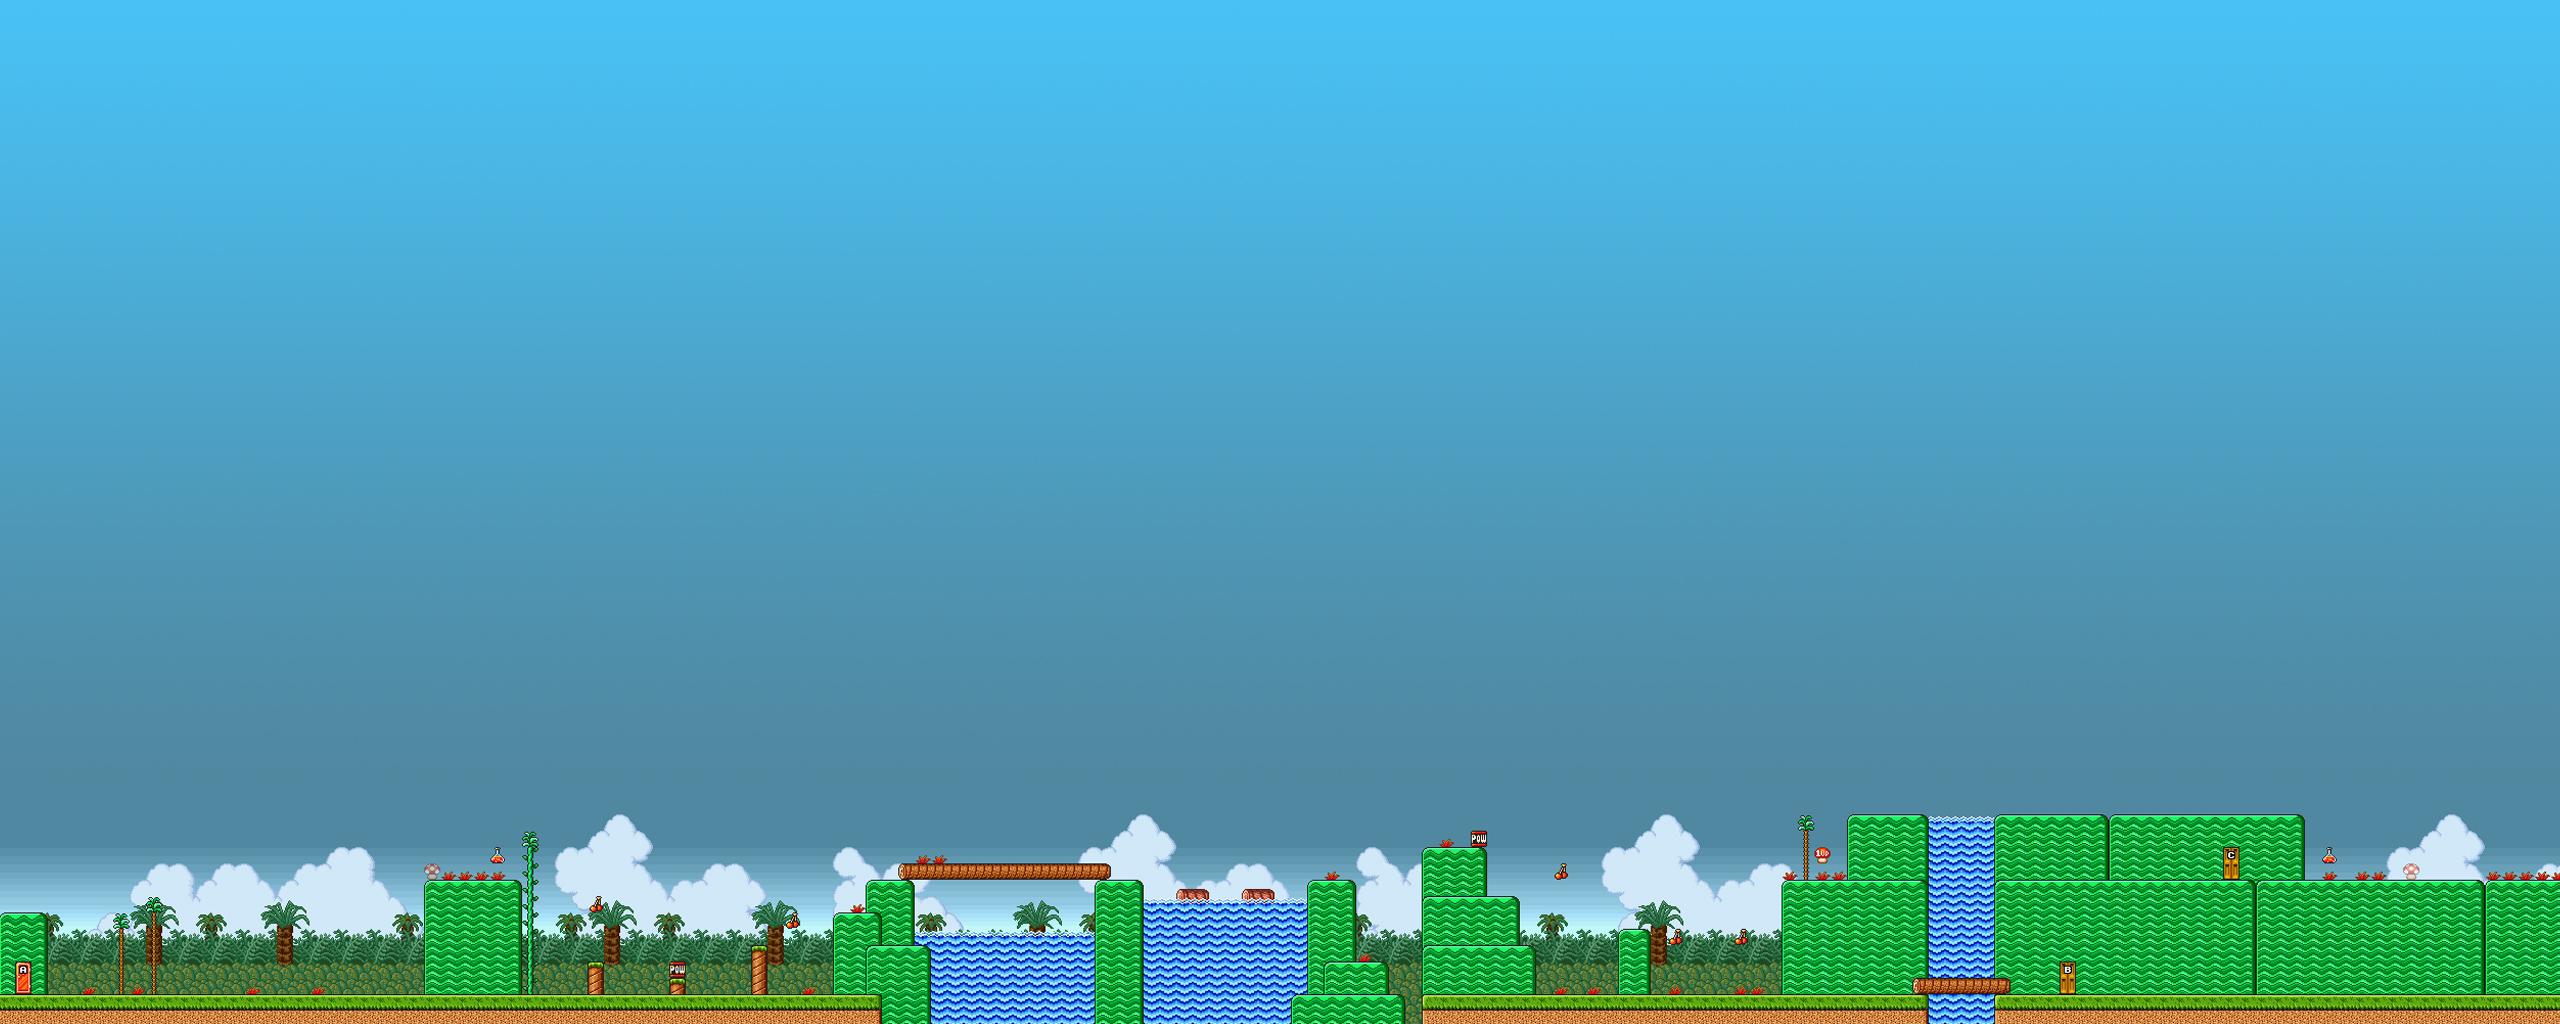 Video Game Computer Wallpapers Desktop Backgrounds 2560x1024 ID 2560x1024